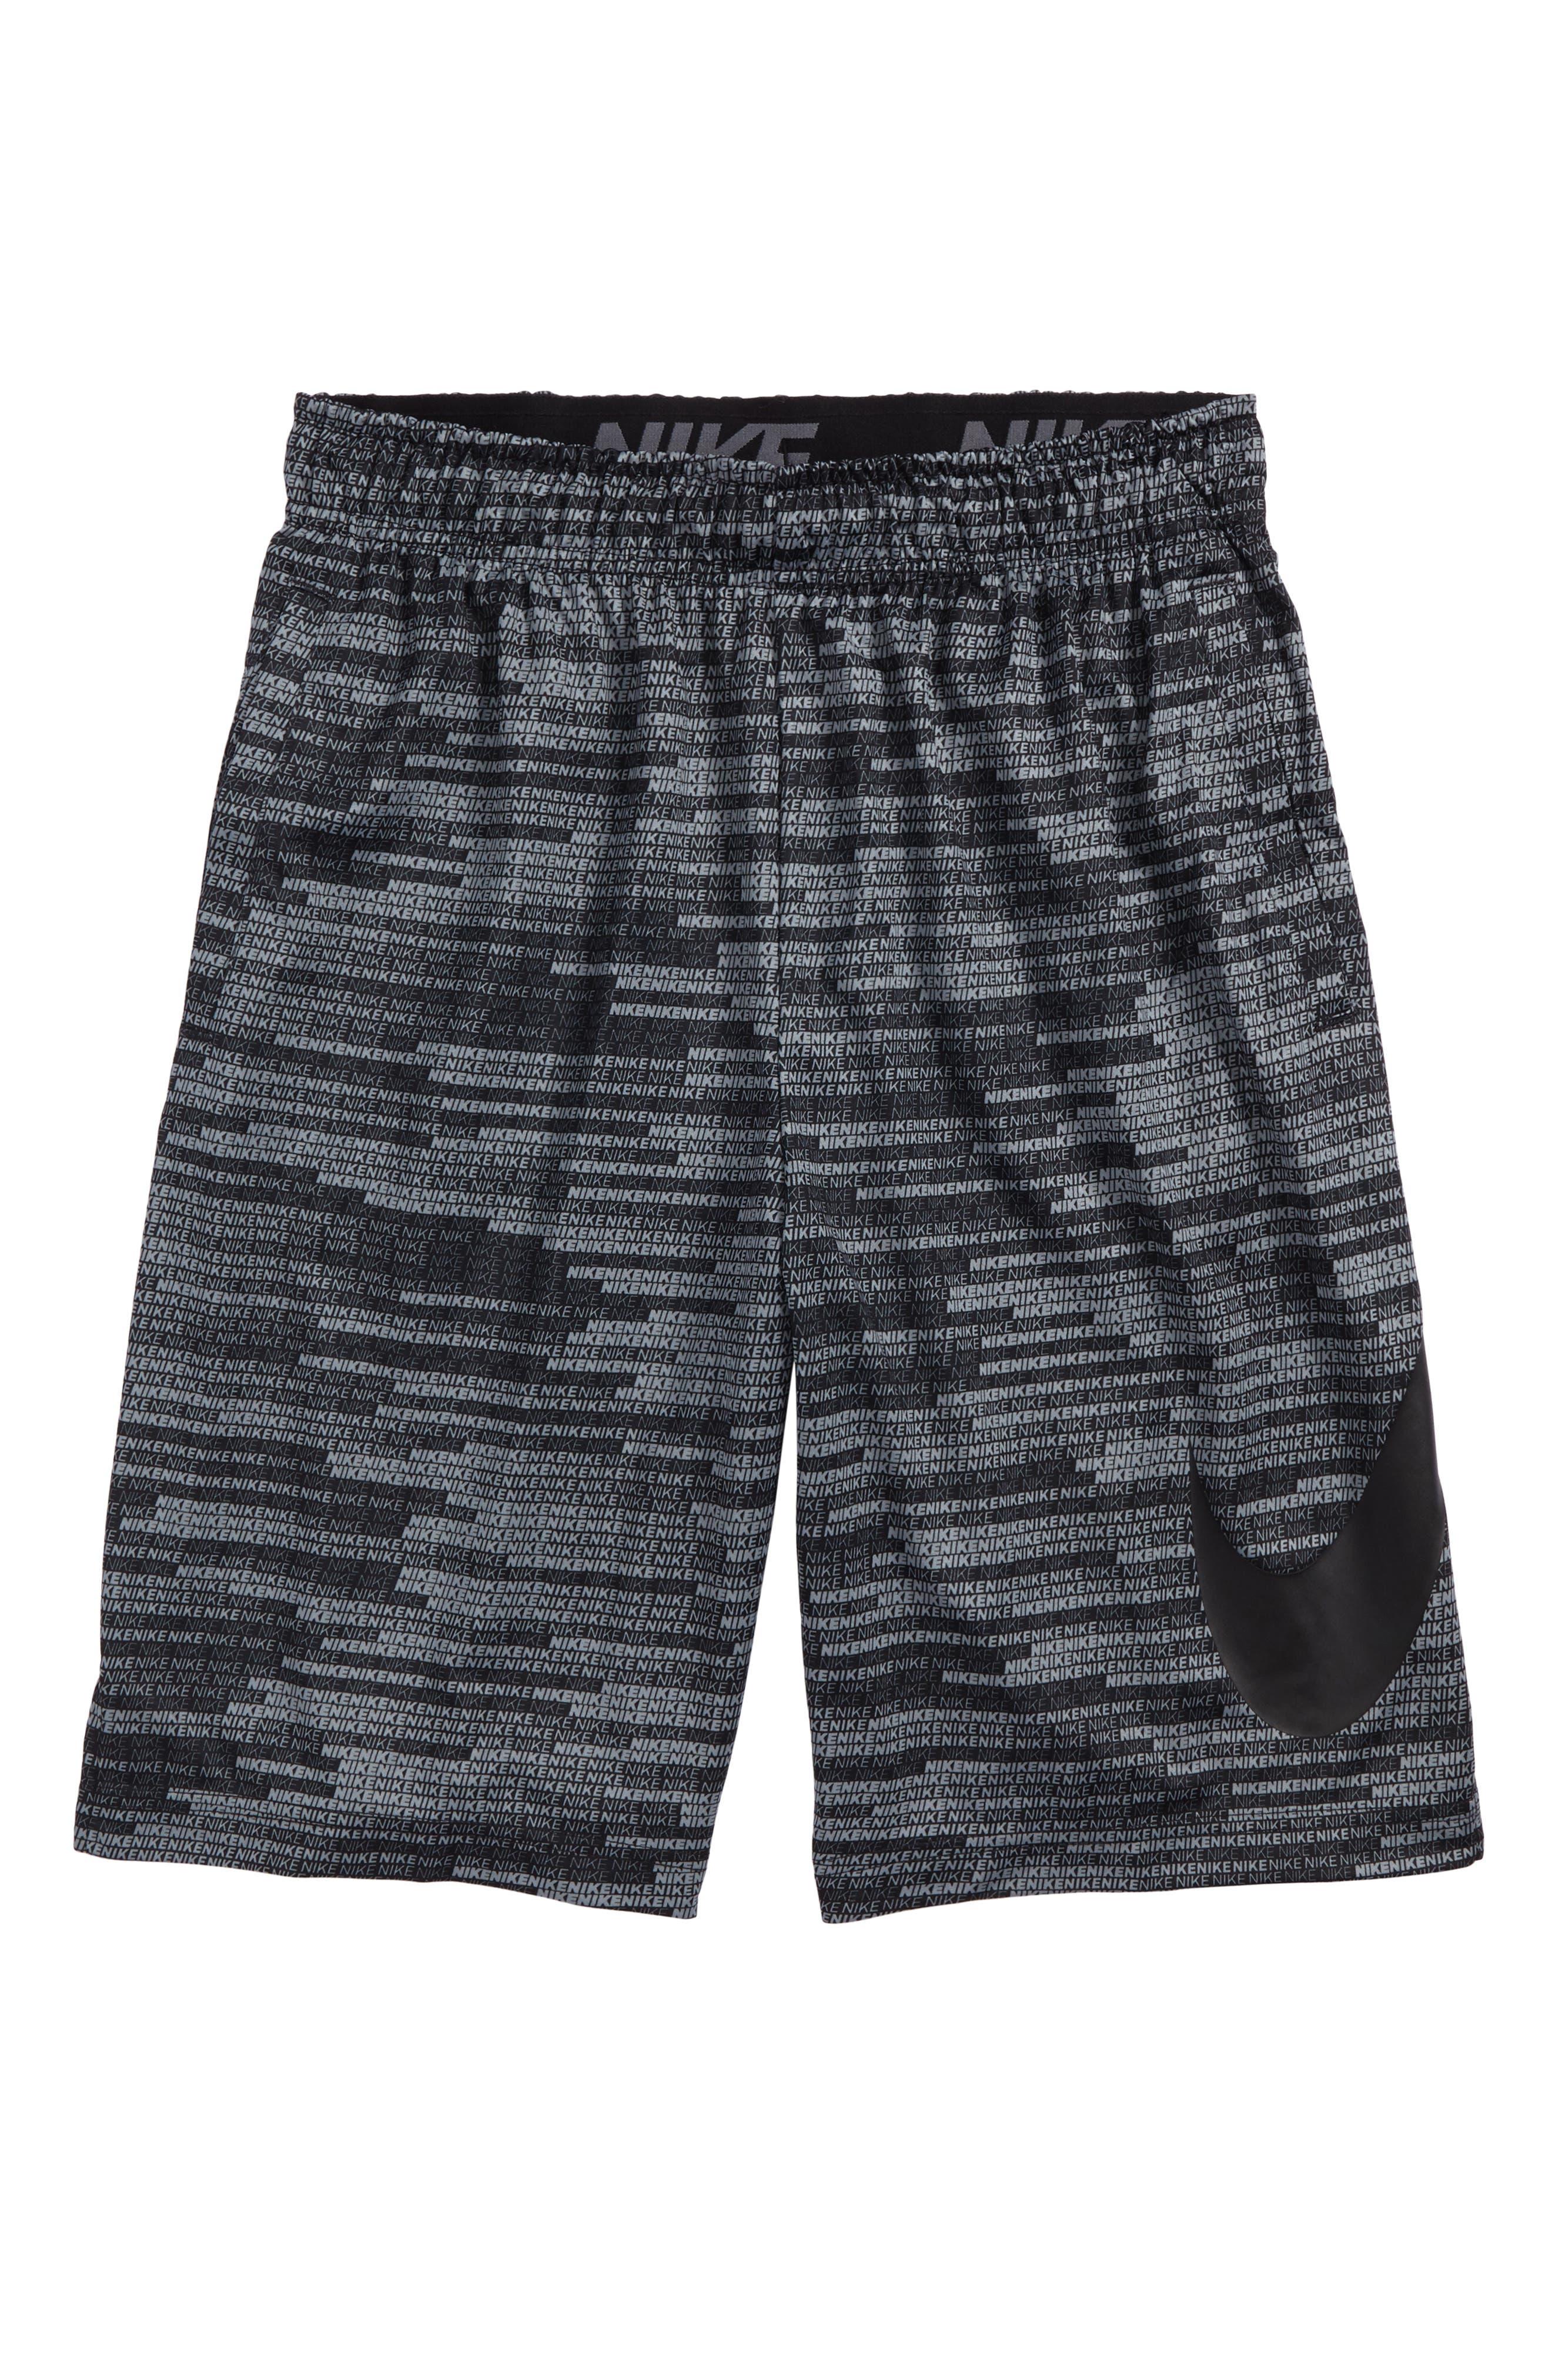 Dry Training Shorts,                         Main,                         color, 010